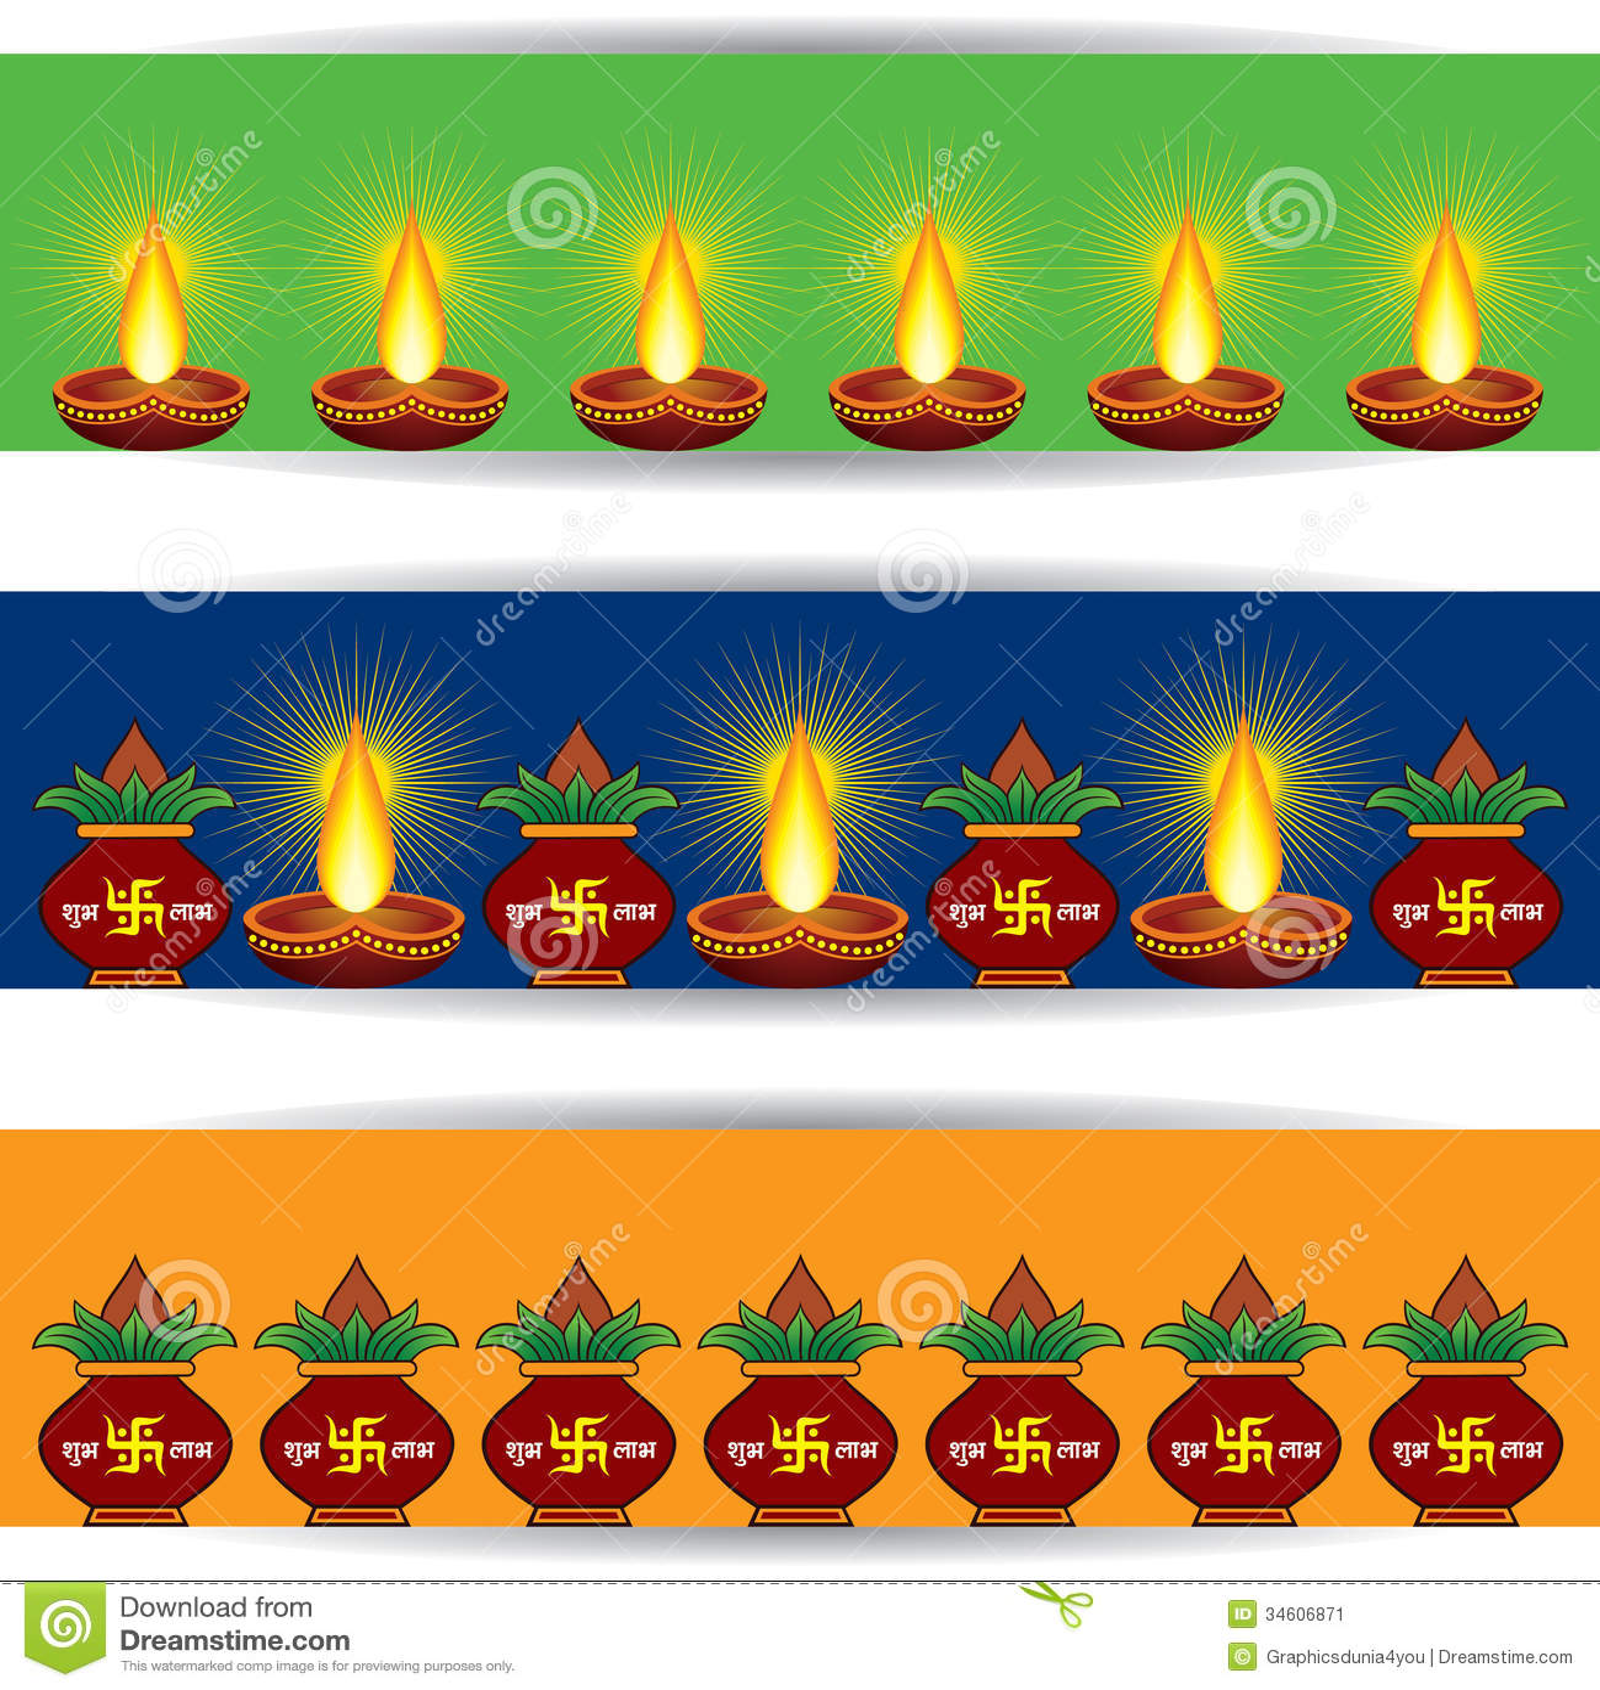 Diwali Greeting Banner For Website Stock Vector Illustration Of